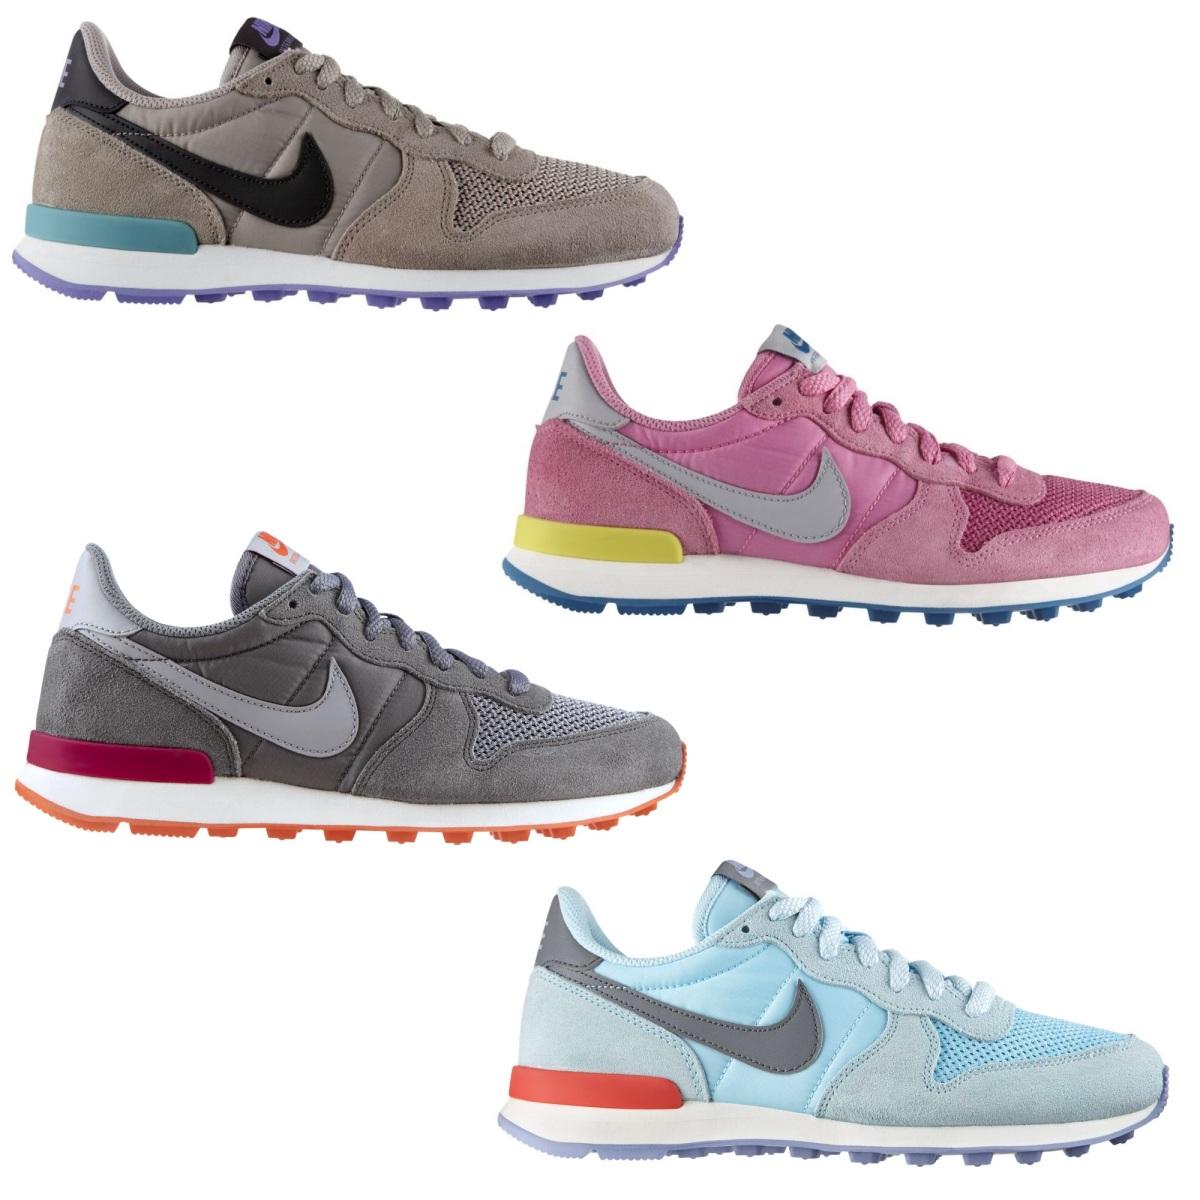 Nike Internationalist Damen Schuhe Turnschuhe